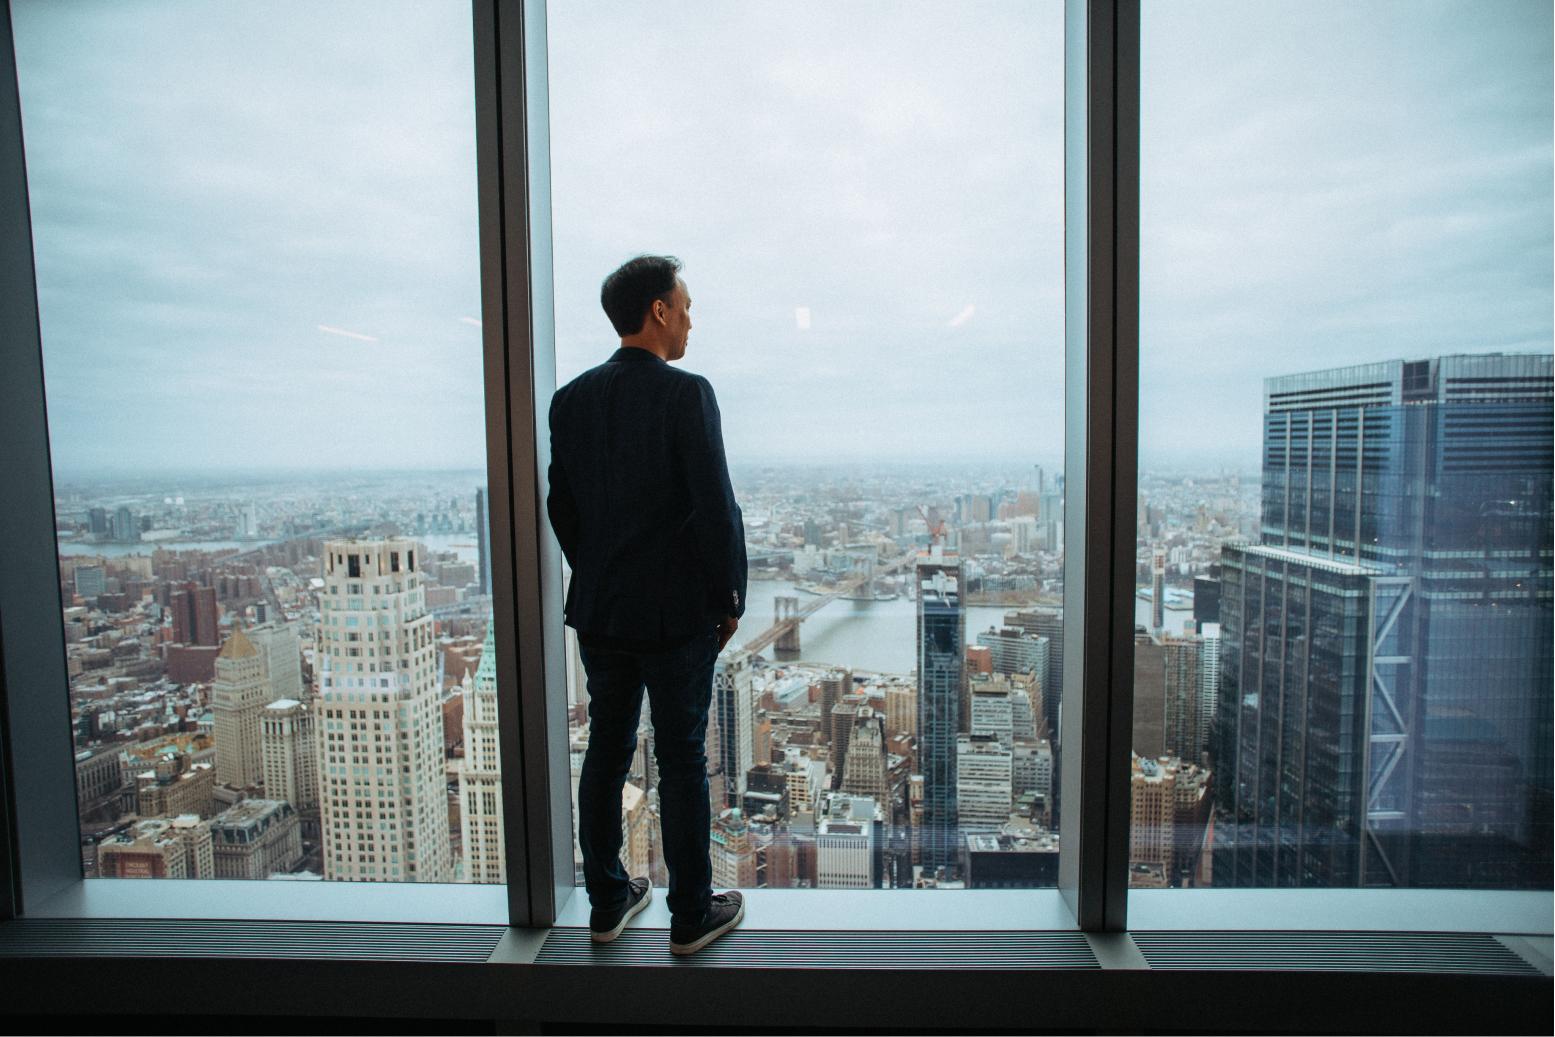 Jim Kwik watching out the window